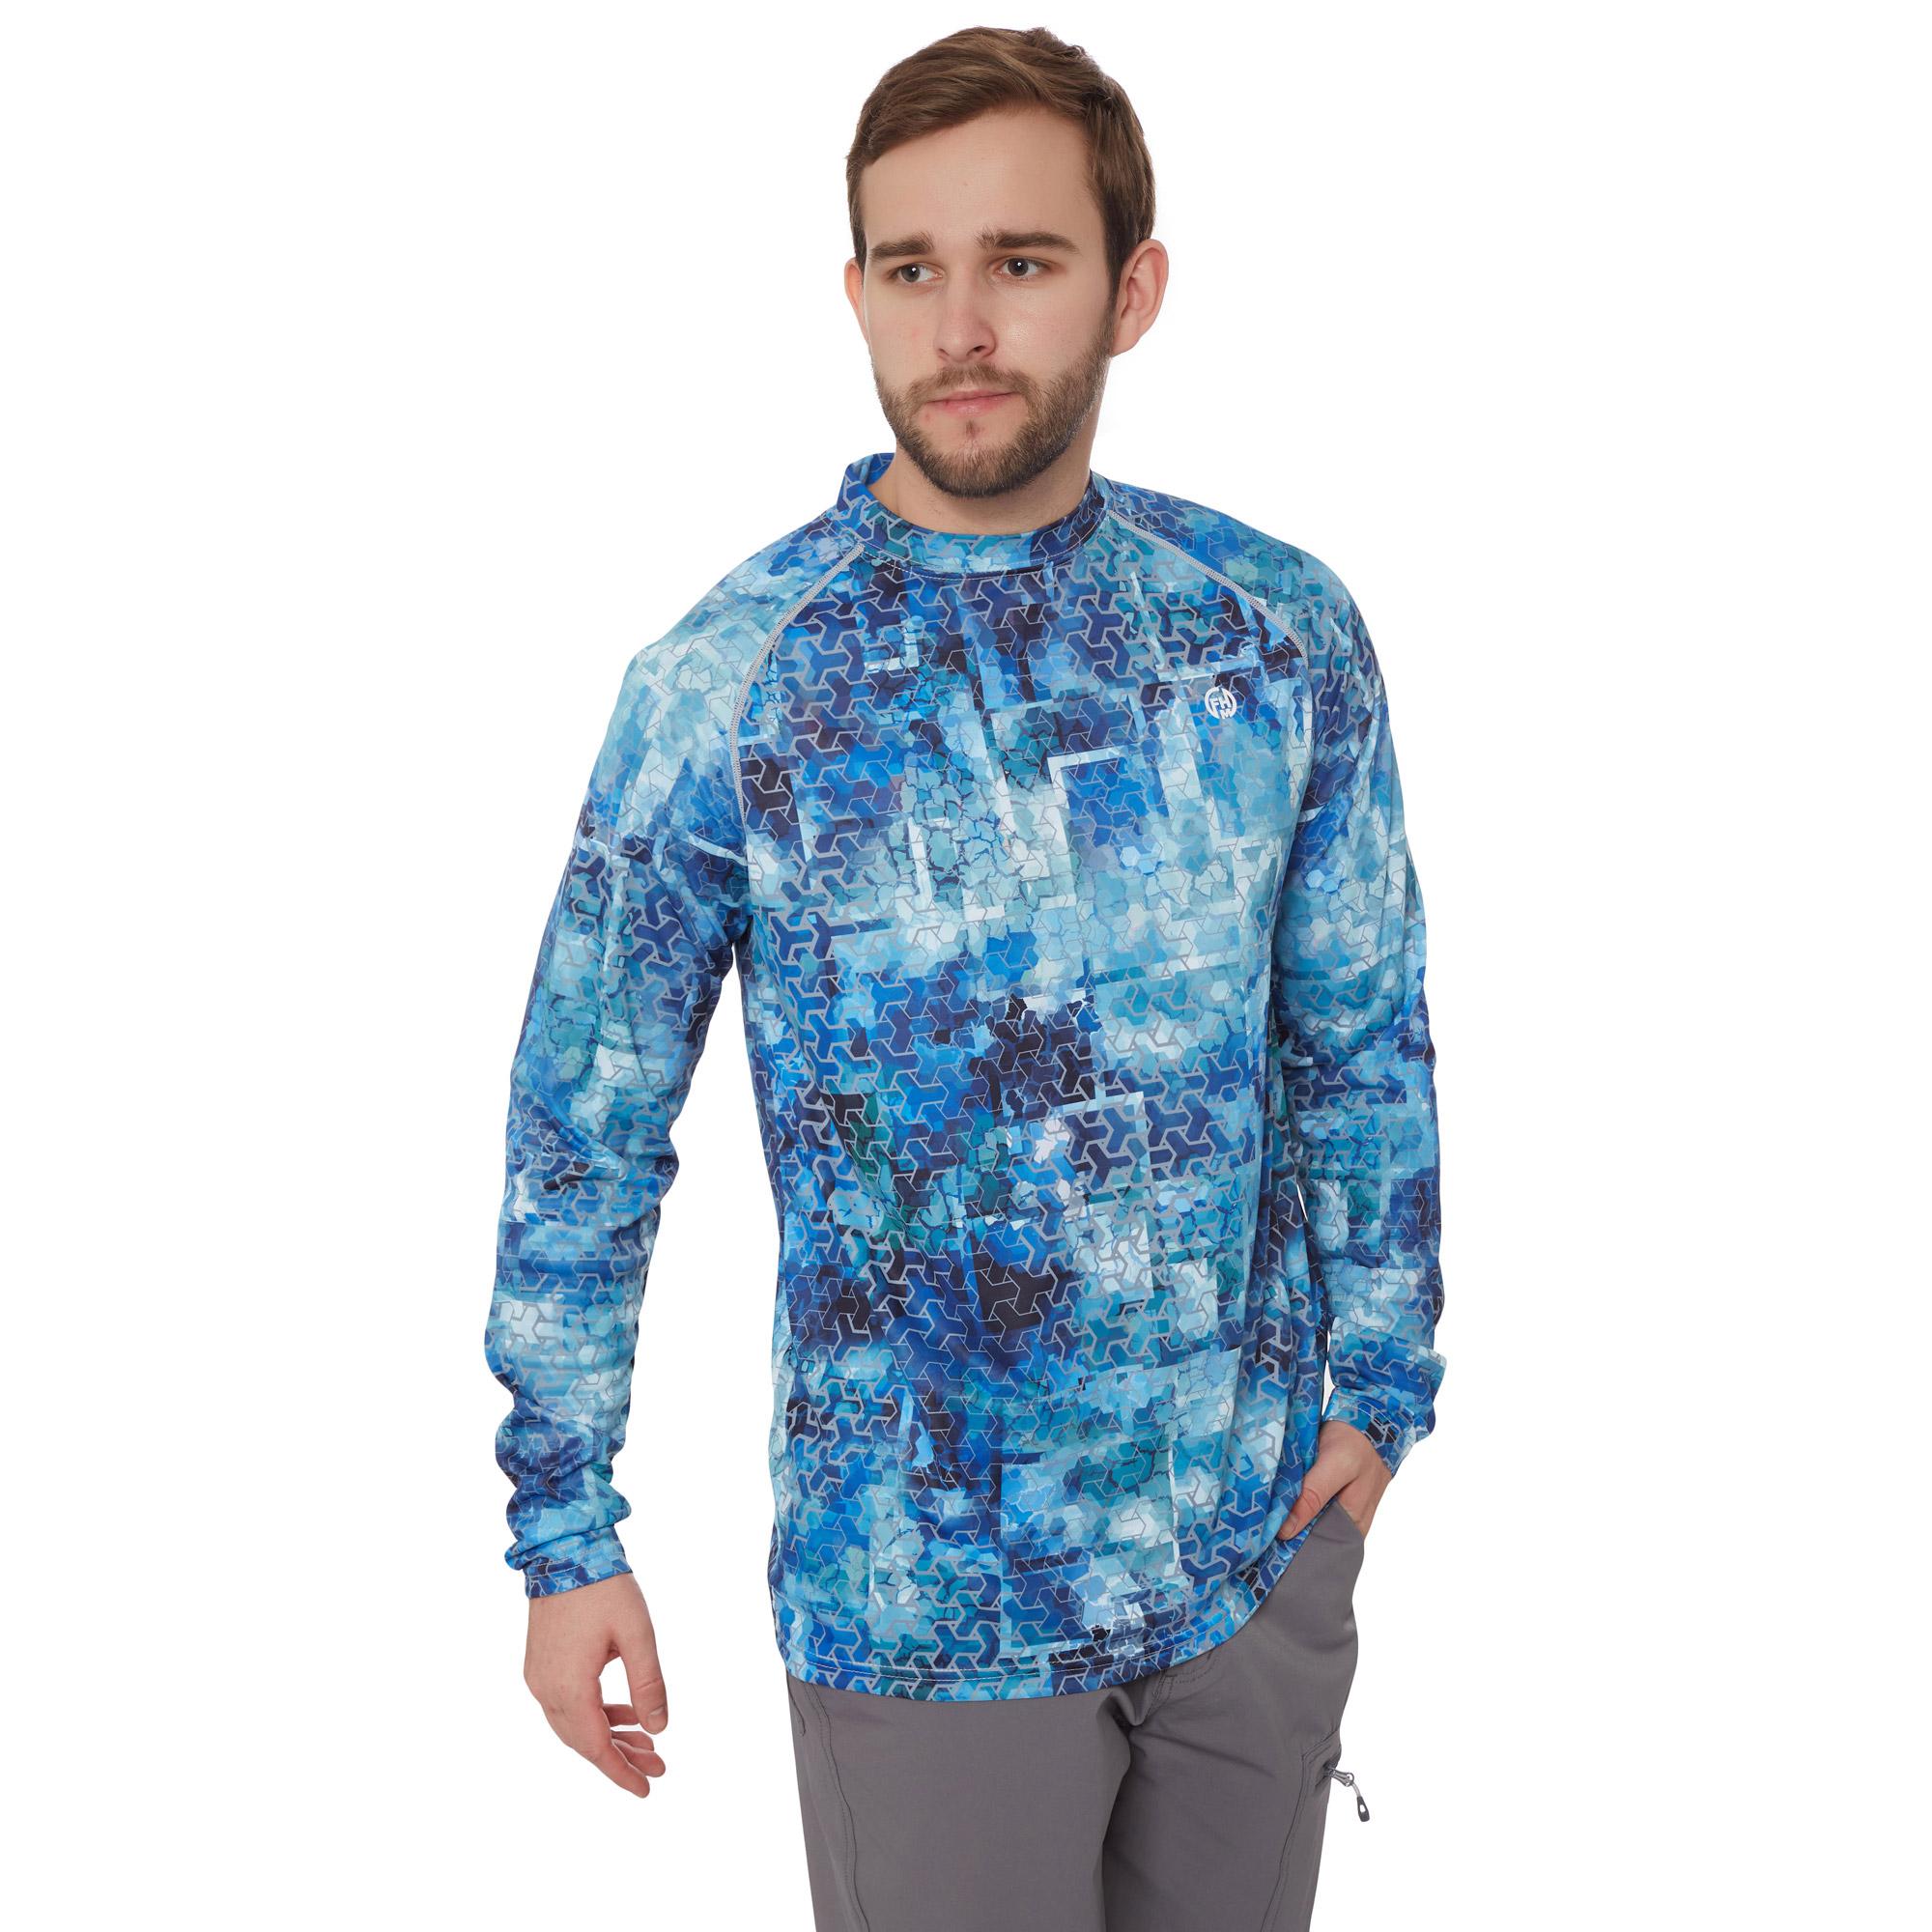 FHM Mark Evo Aqua Blue UPF 50+ футболка для рыбалки